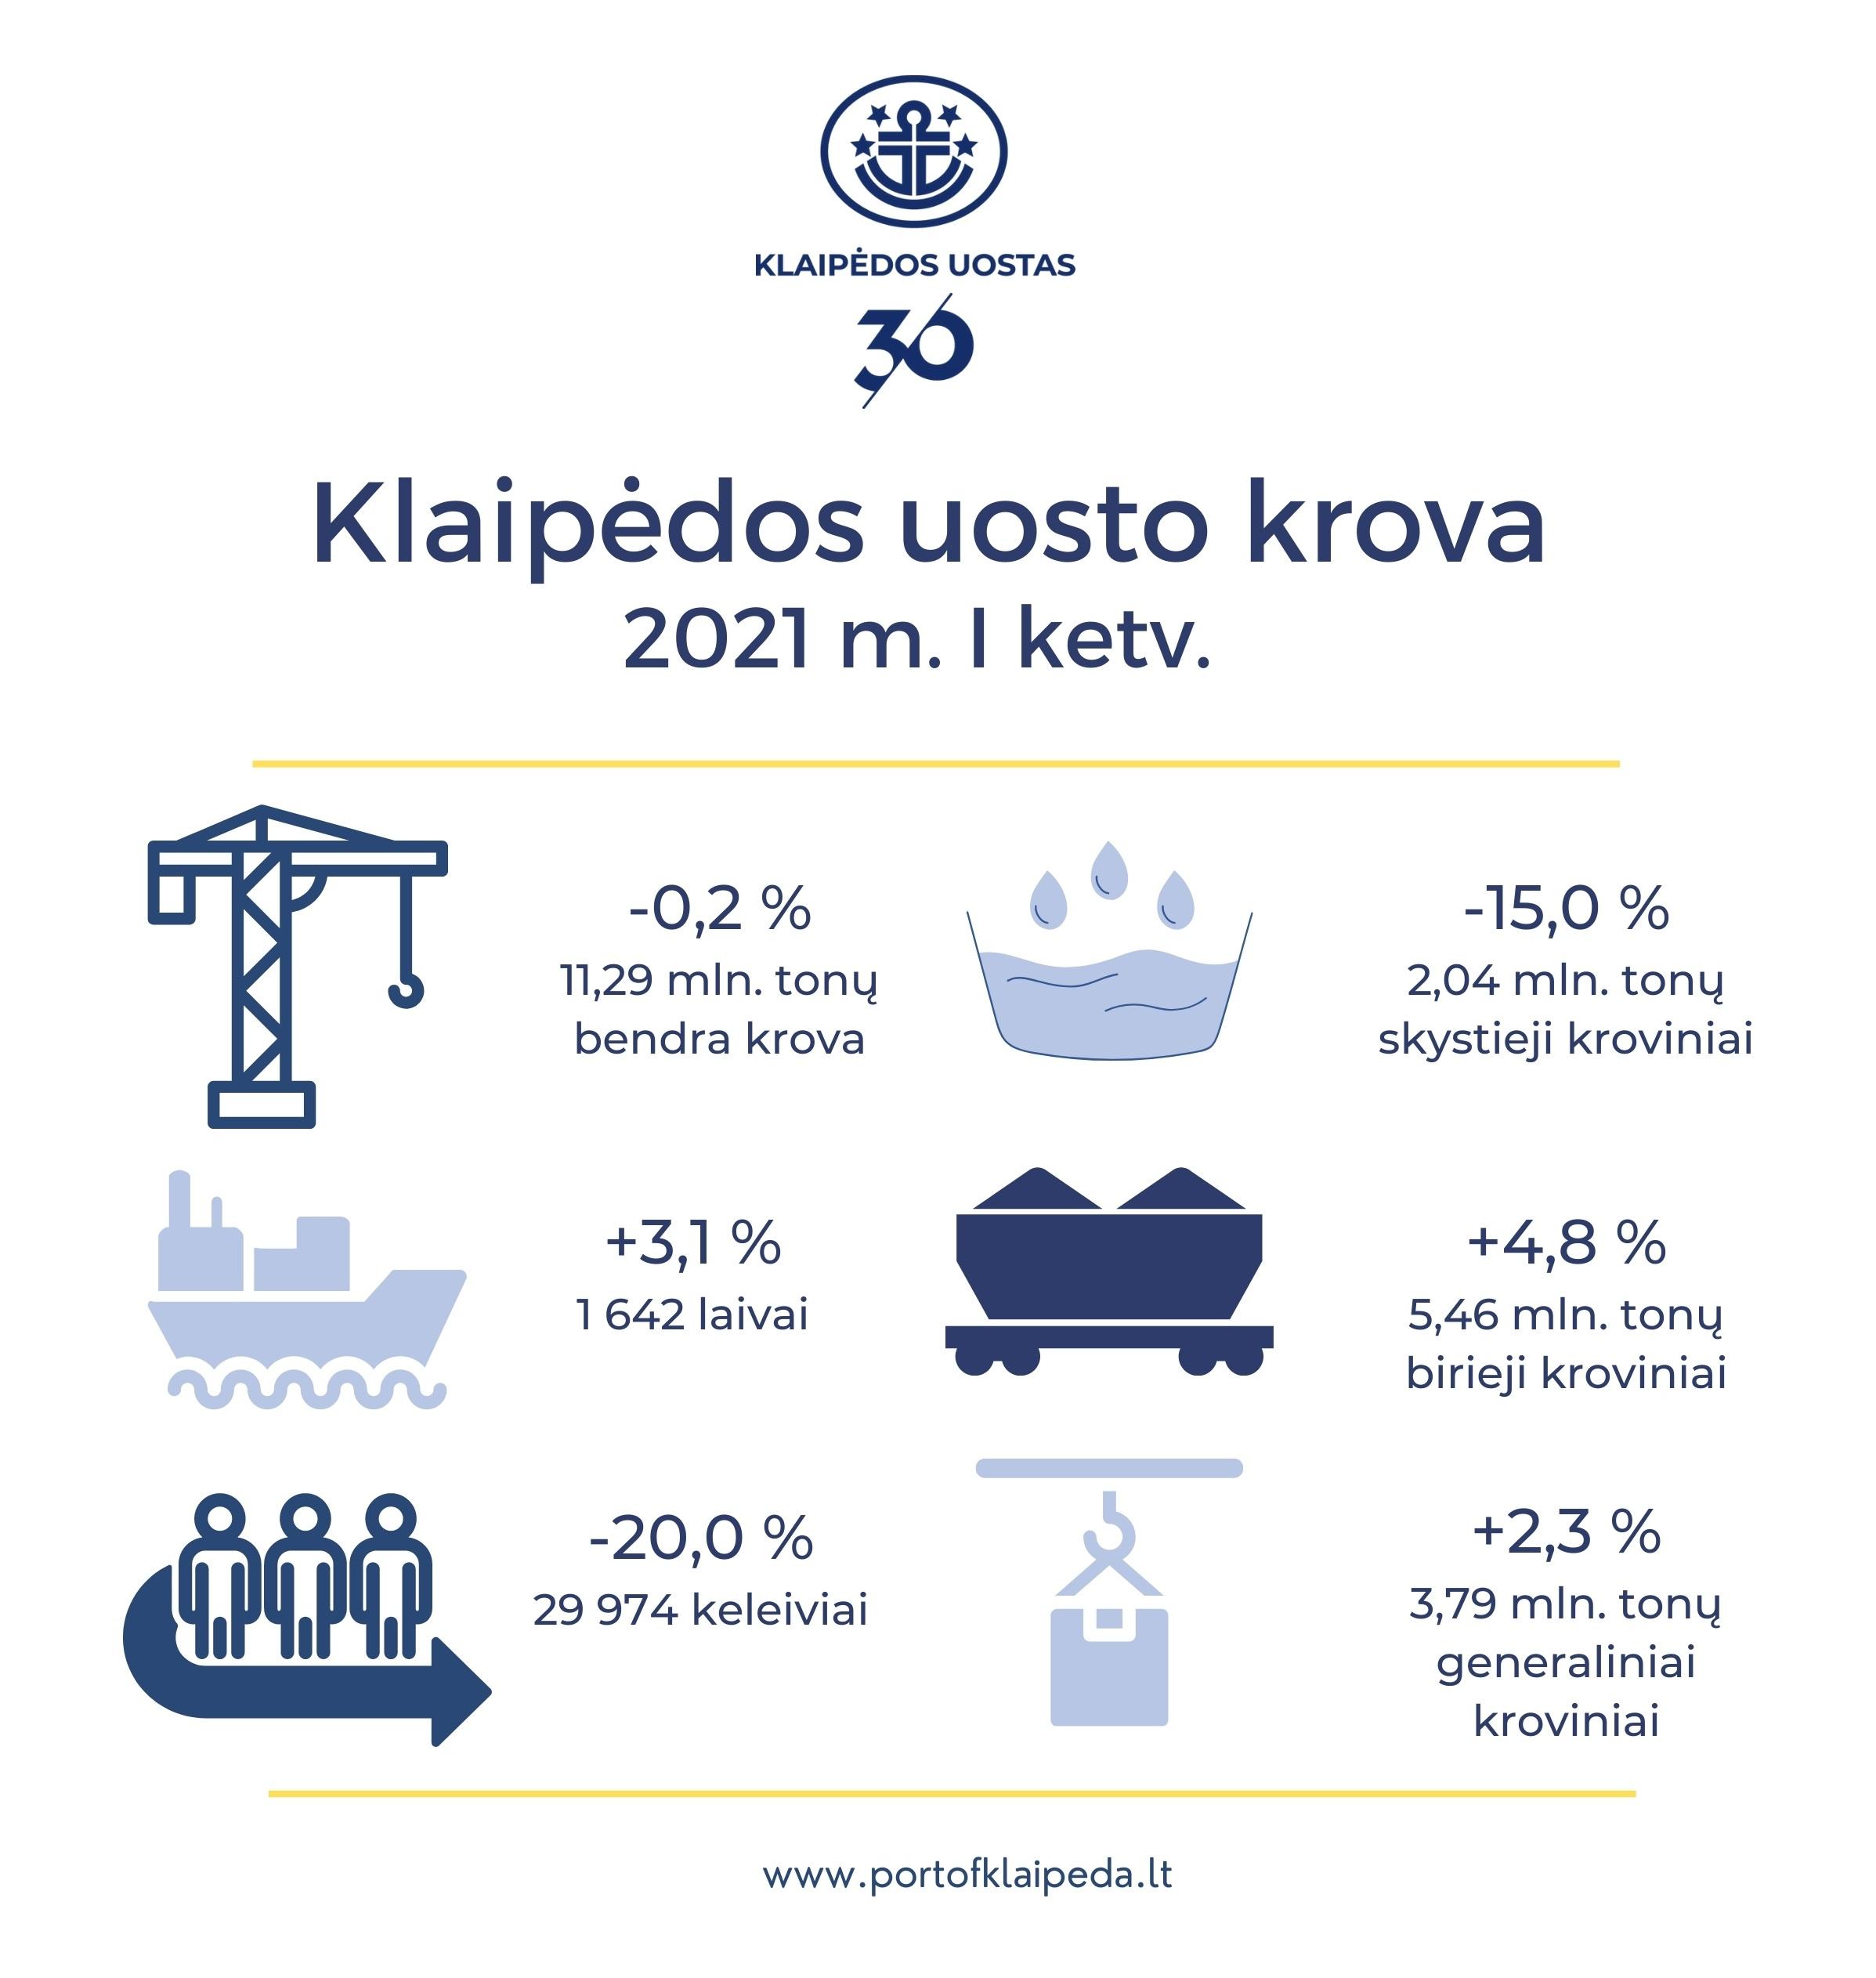 В I квартале 2021 года грузооборот Клайпедского порта снизился на 0,2% 3